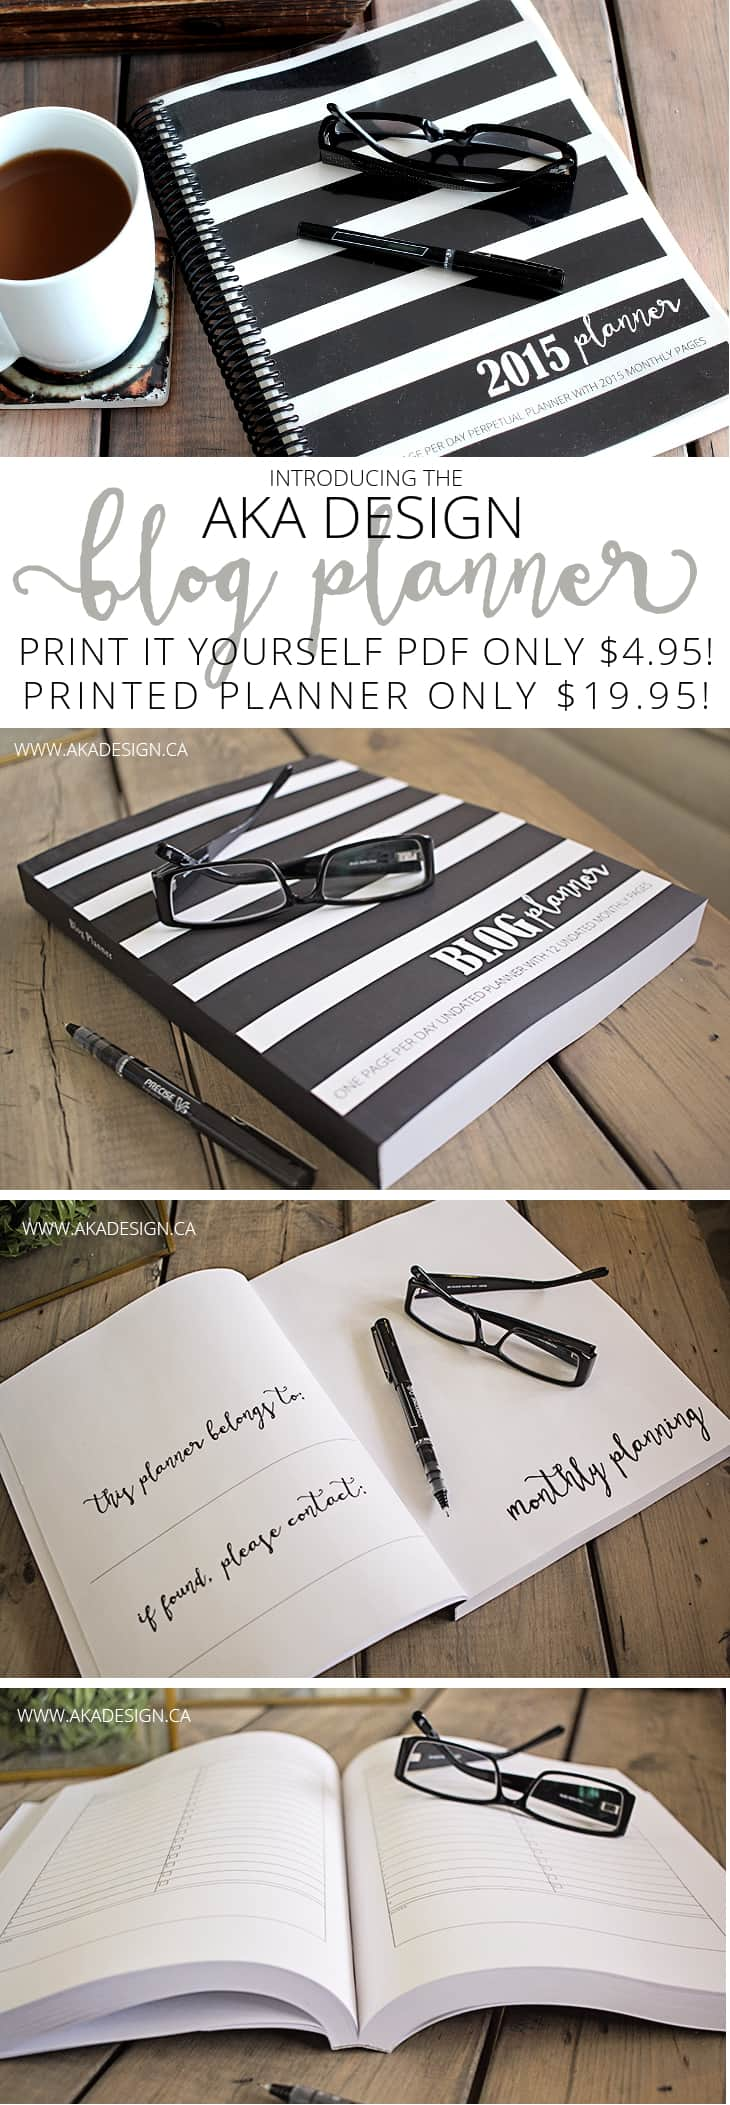 Aka design blog pdf and printed planner for Planner decorating blogs